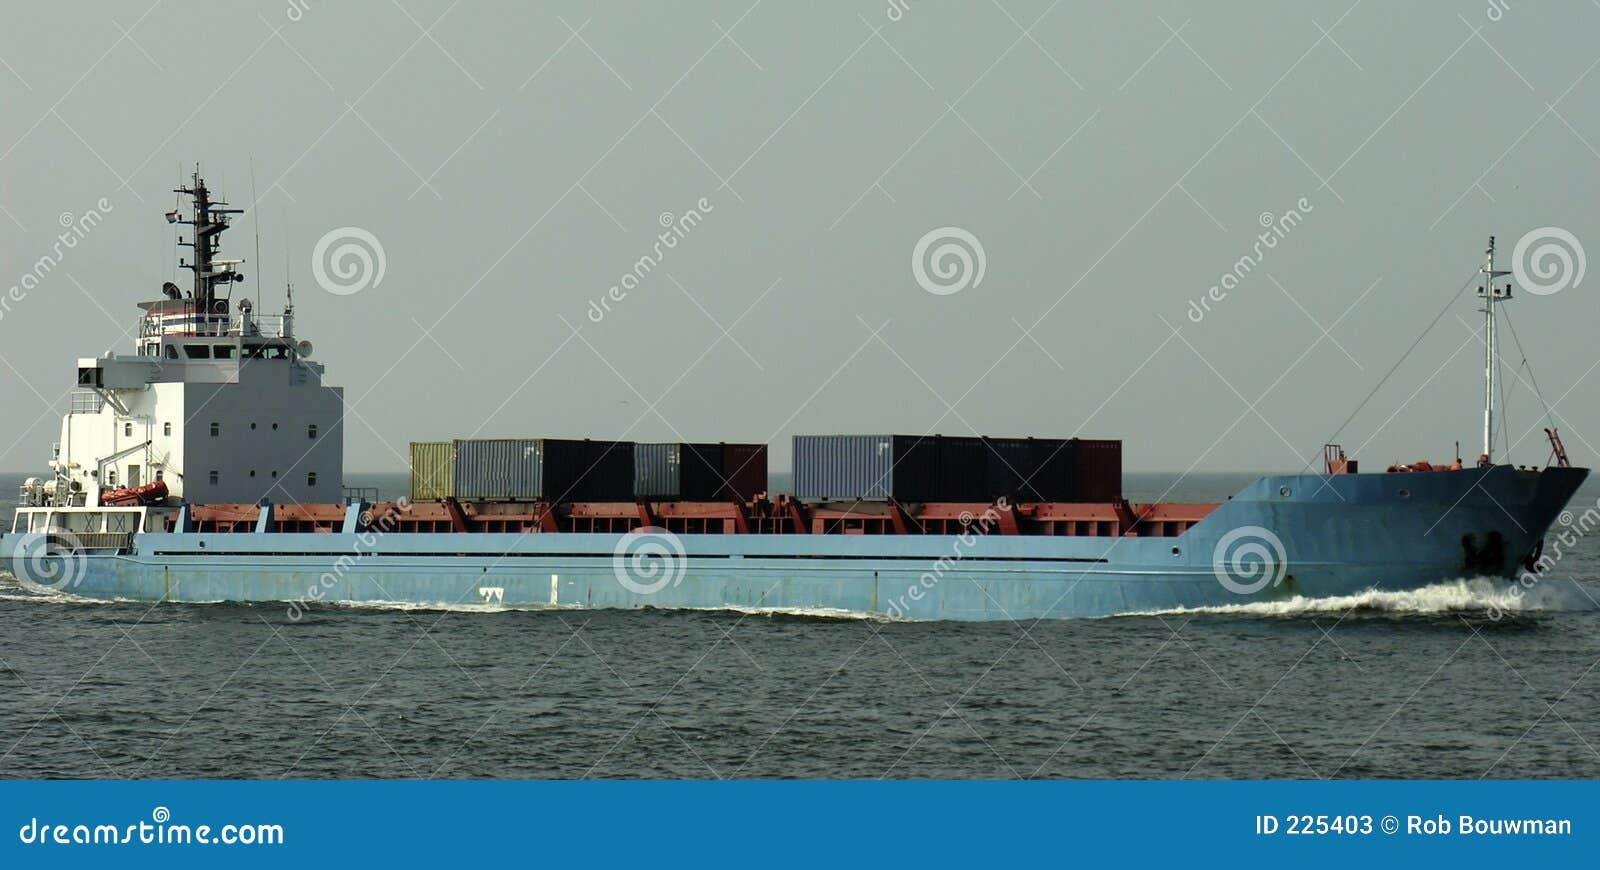 Download Ship stock image. Image of blue, mast, slow, work, petrol - 225403